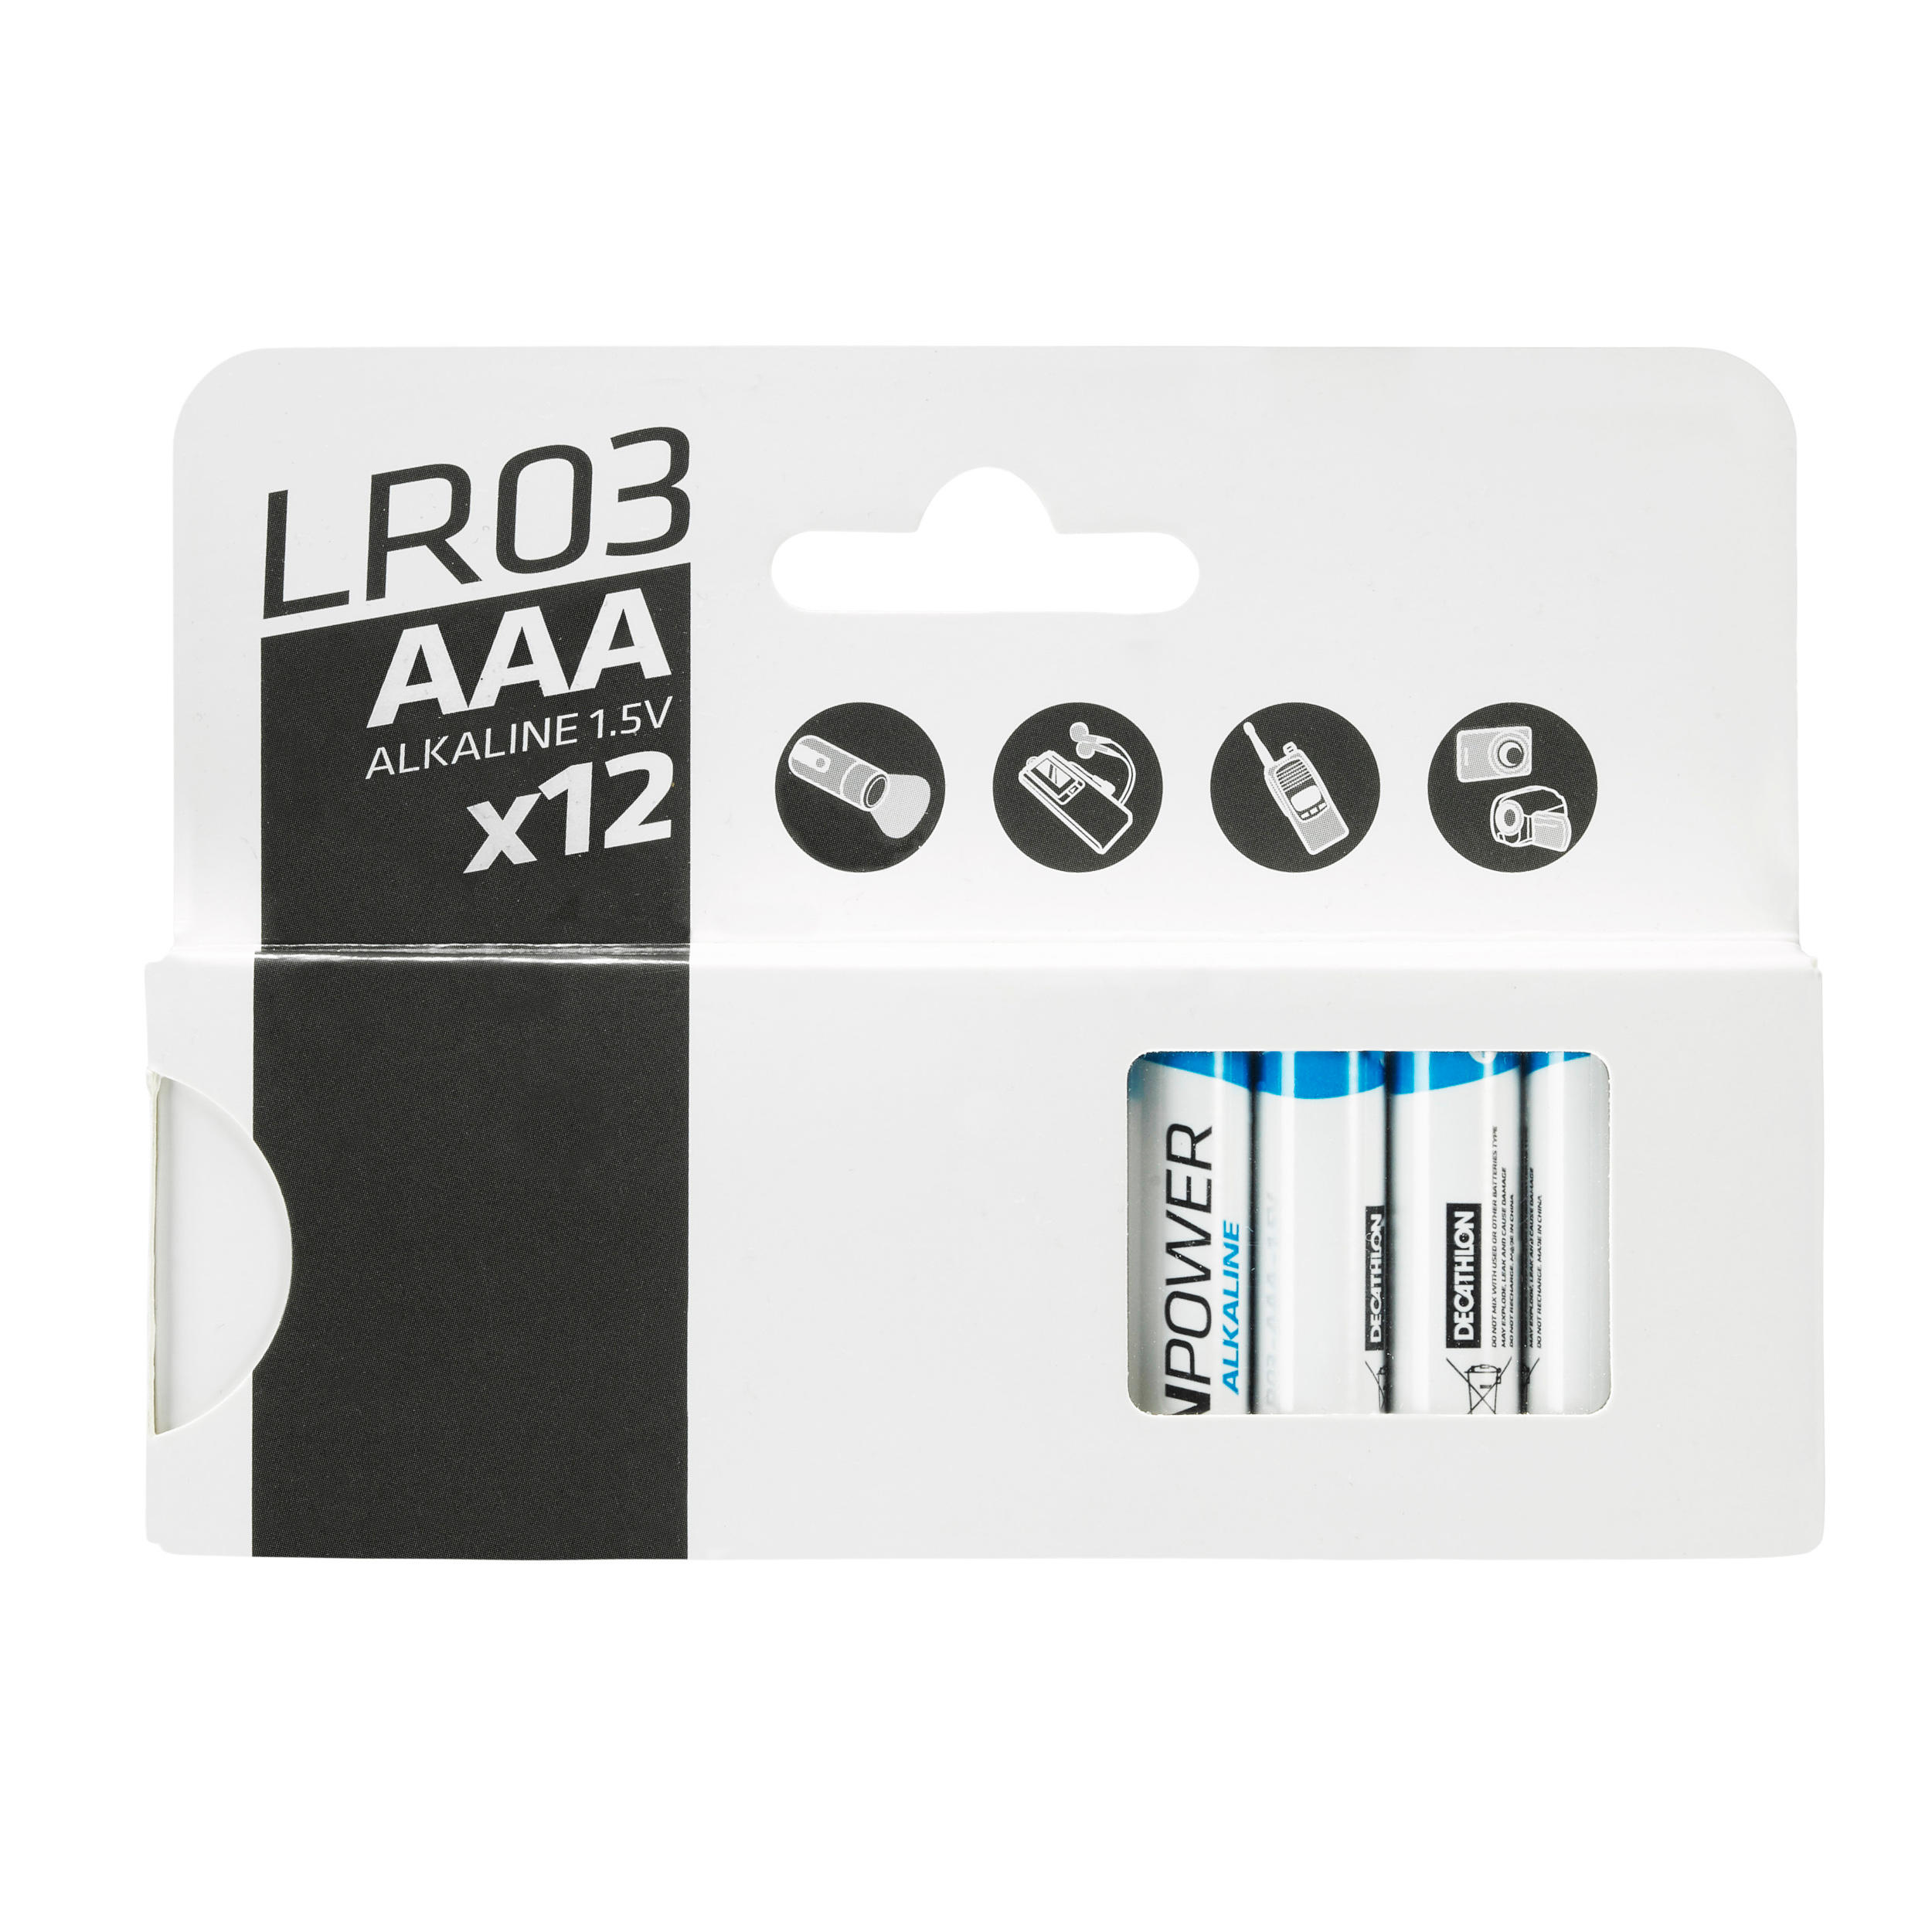 Baterii alcaline LR03 - AAAx12